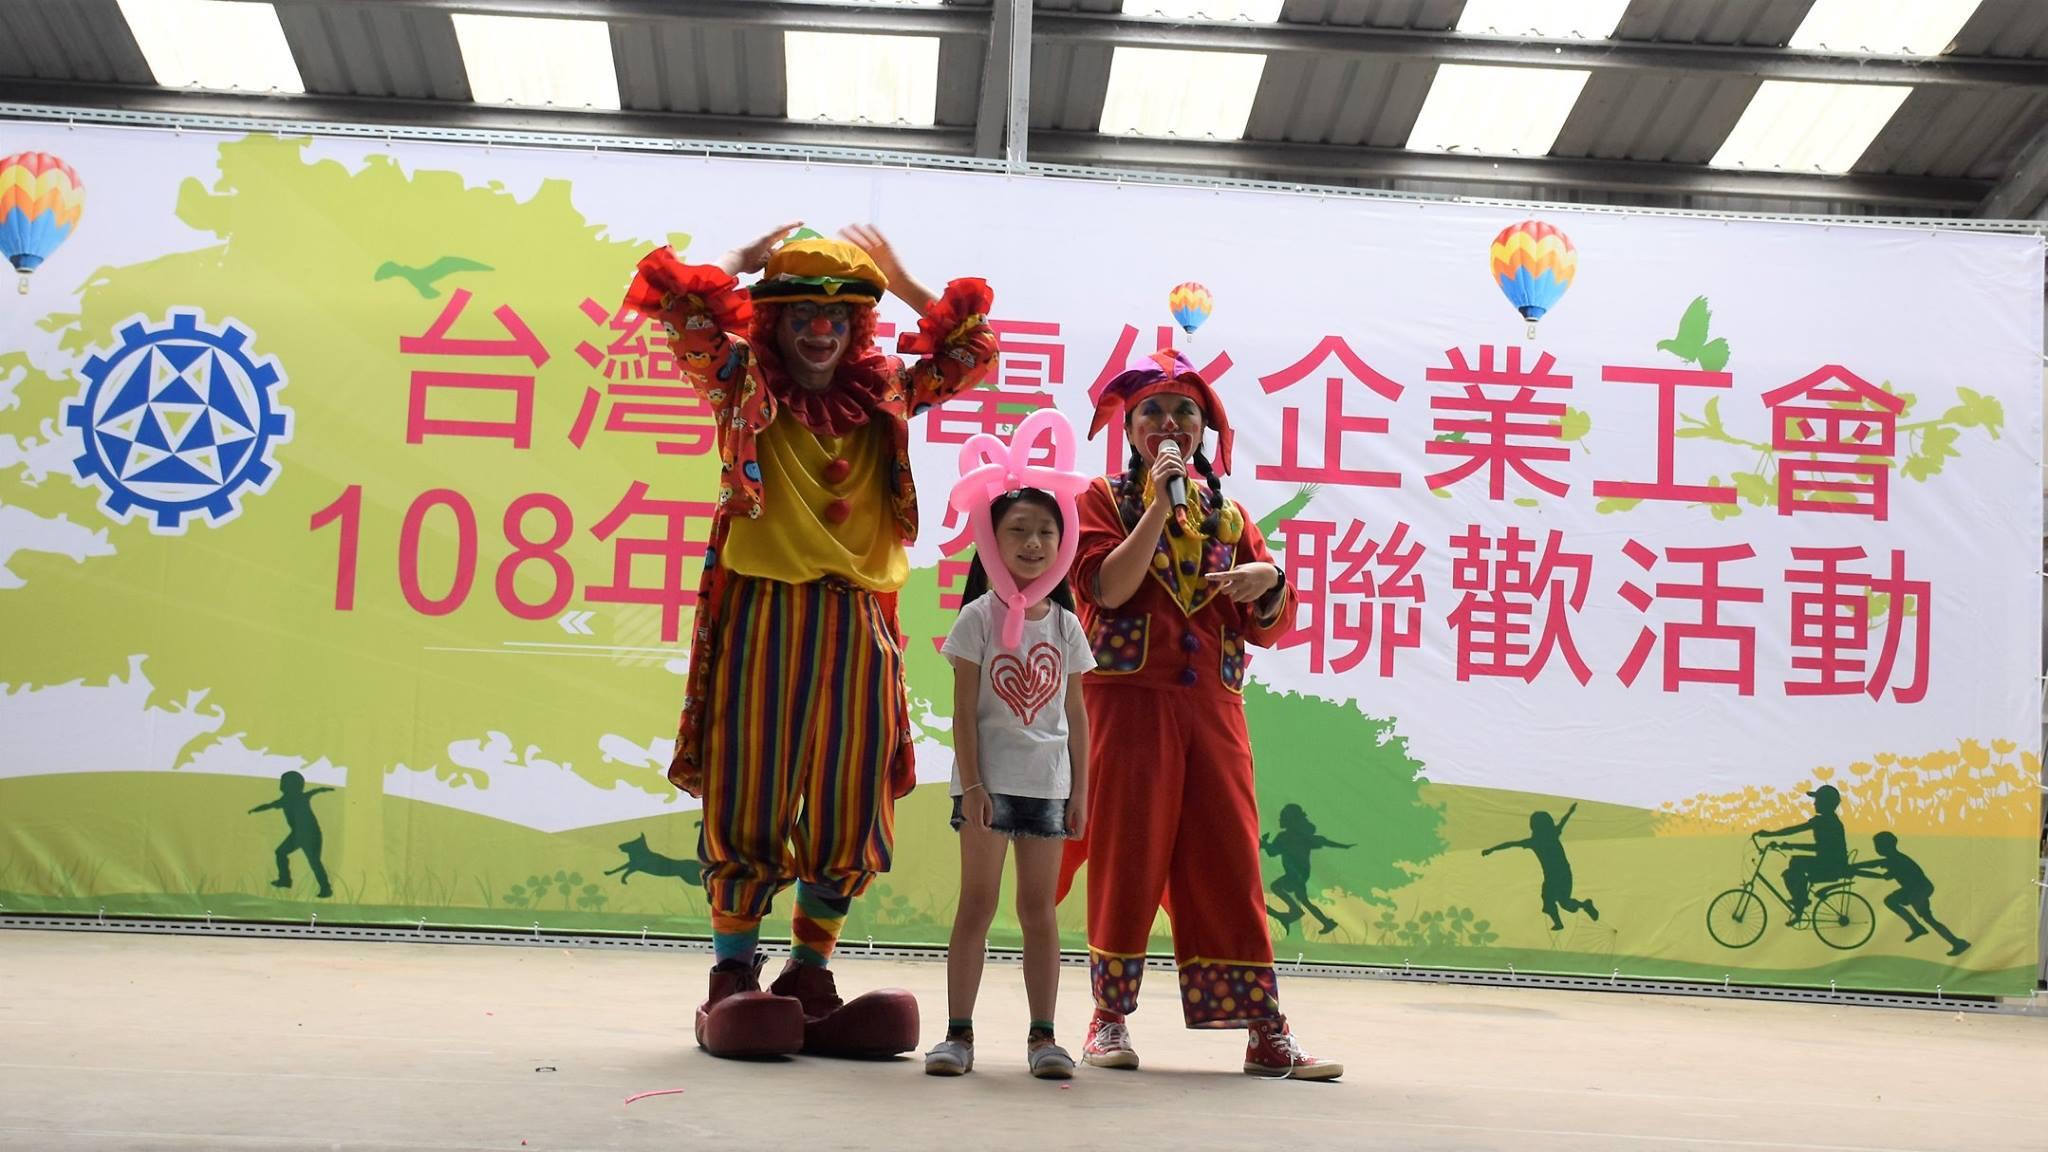 Clown balloon: 小丑氣球